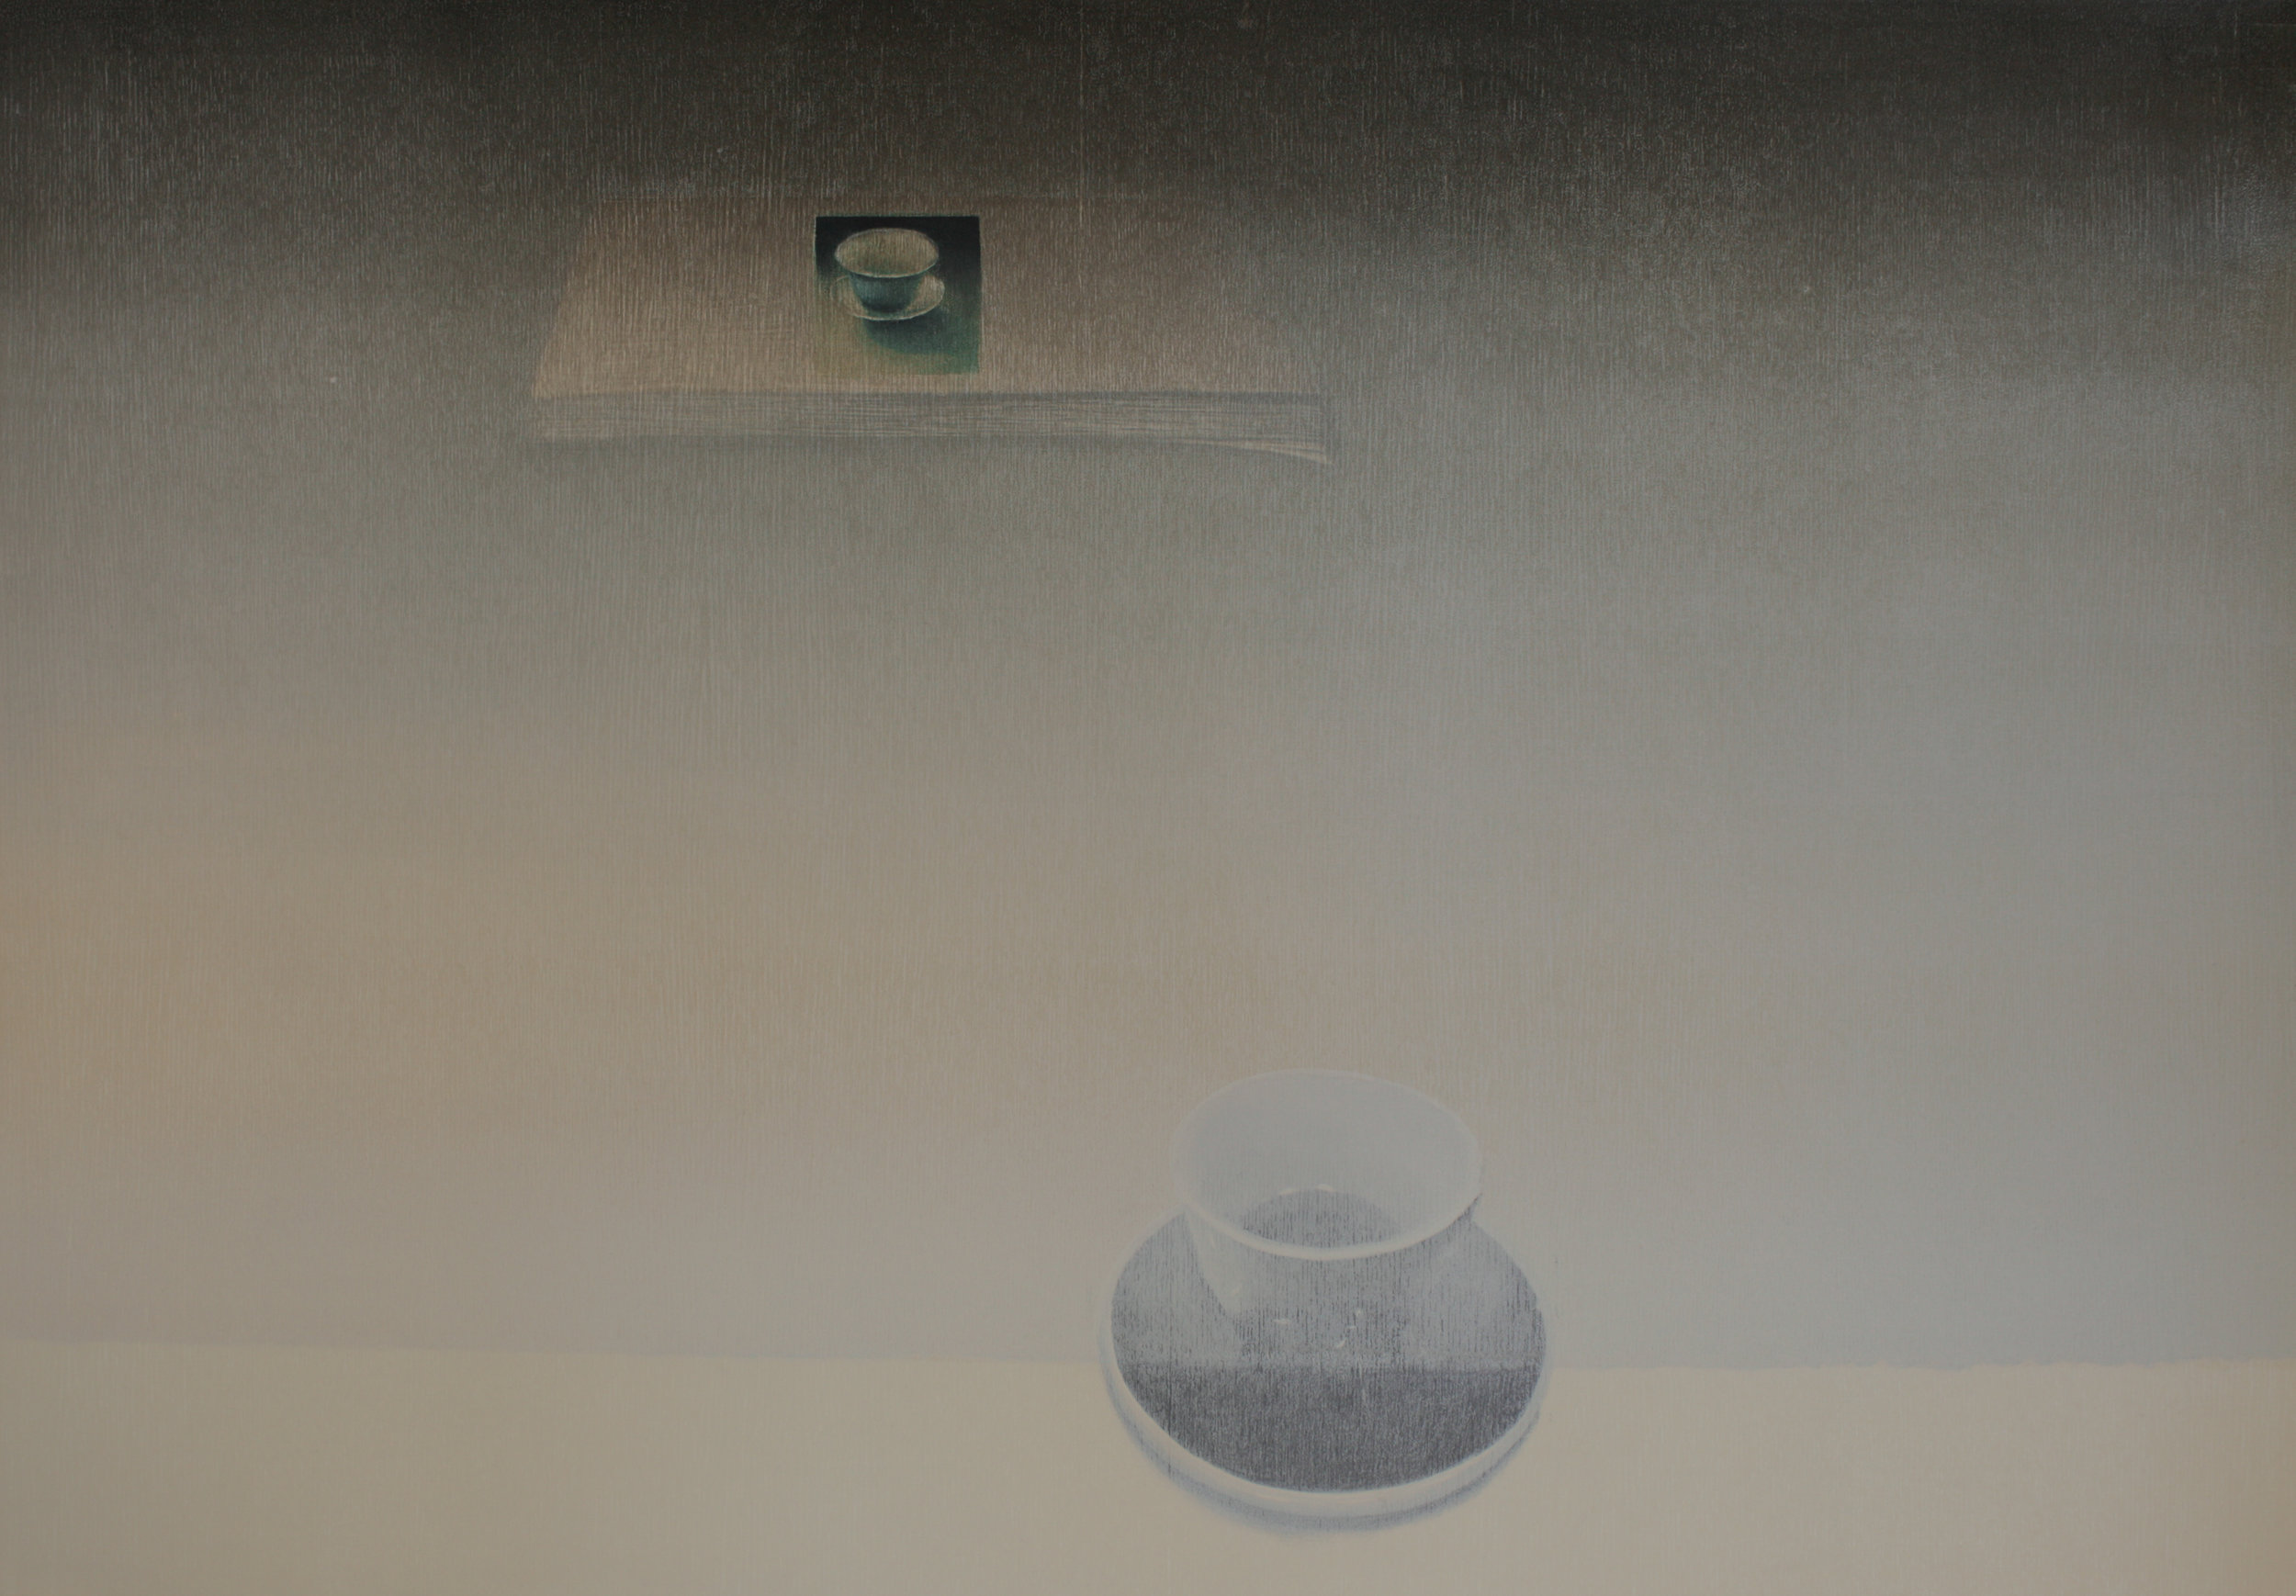 Praween PIANGCHOOMPU, Equilibrium #7, 2019, Woodcut on Paper, 1 of 5, 60 x 85 cm, Affinity Art.jpg